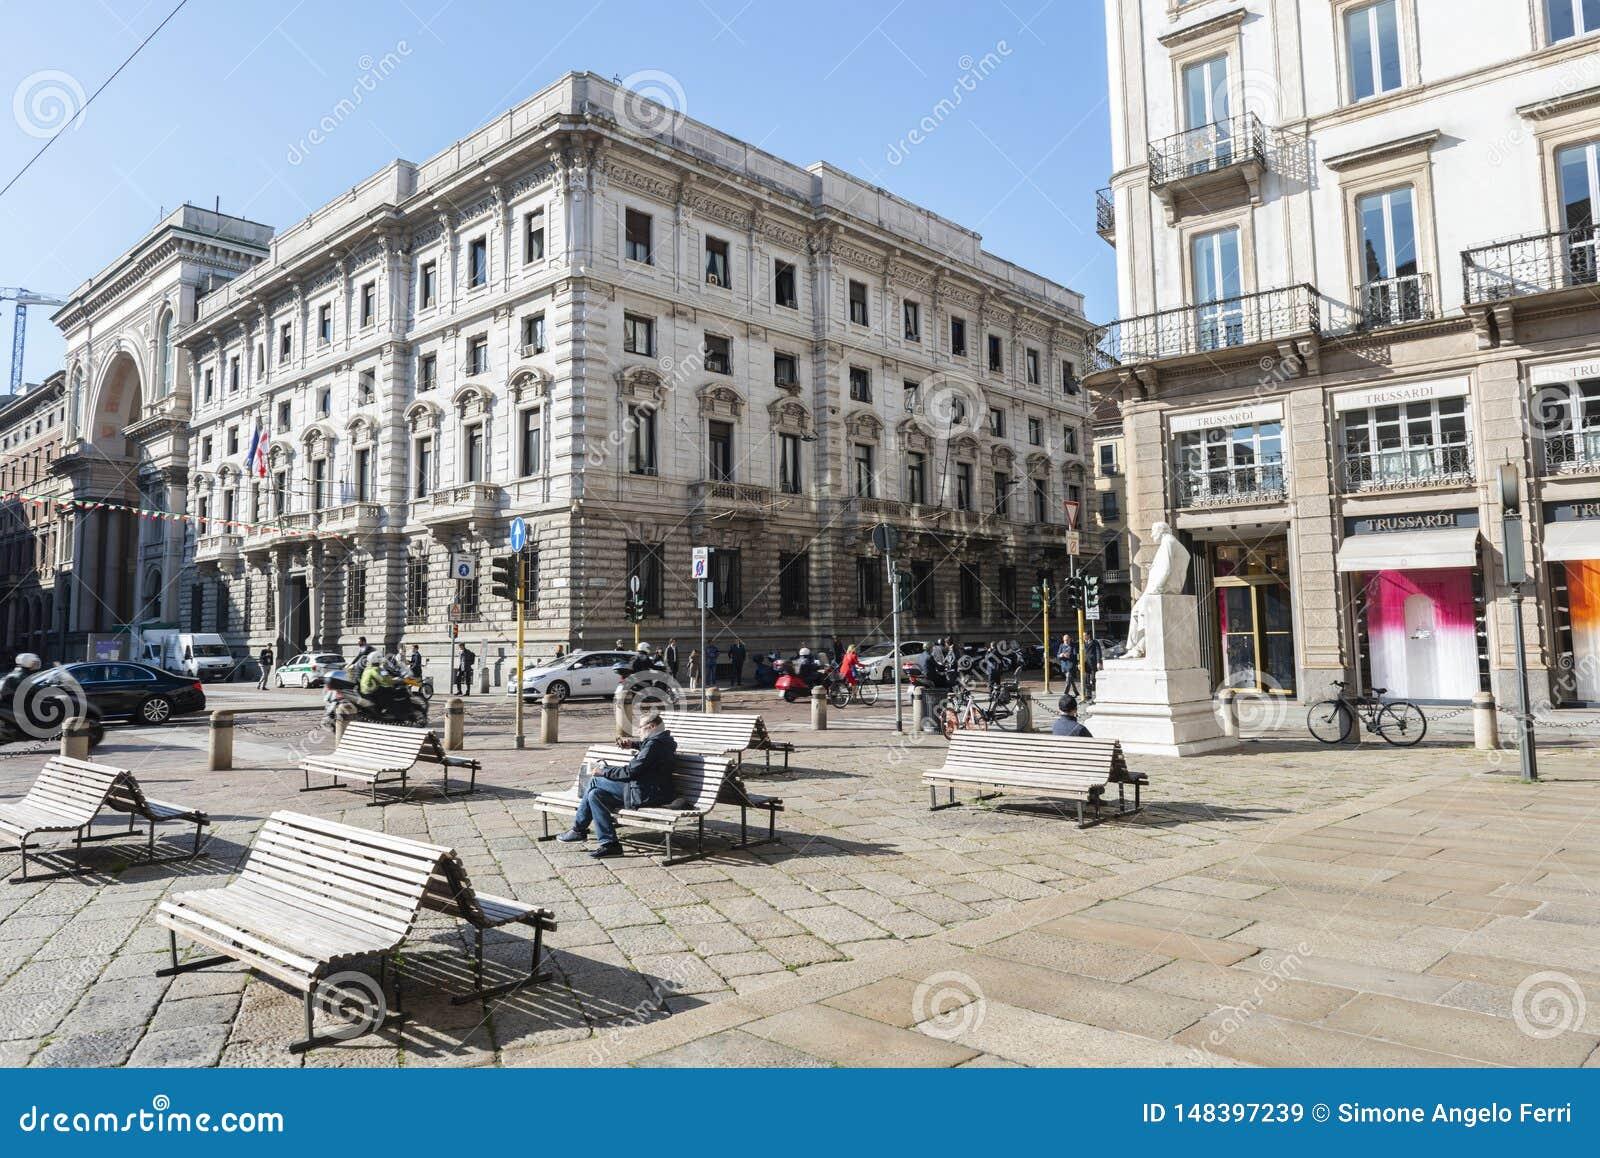 Piazza della Scala located between the city of Milan